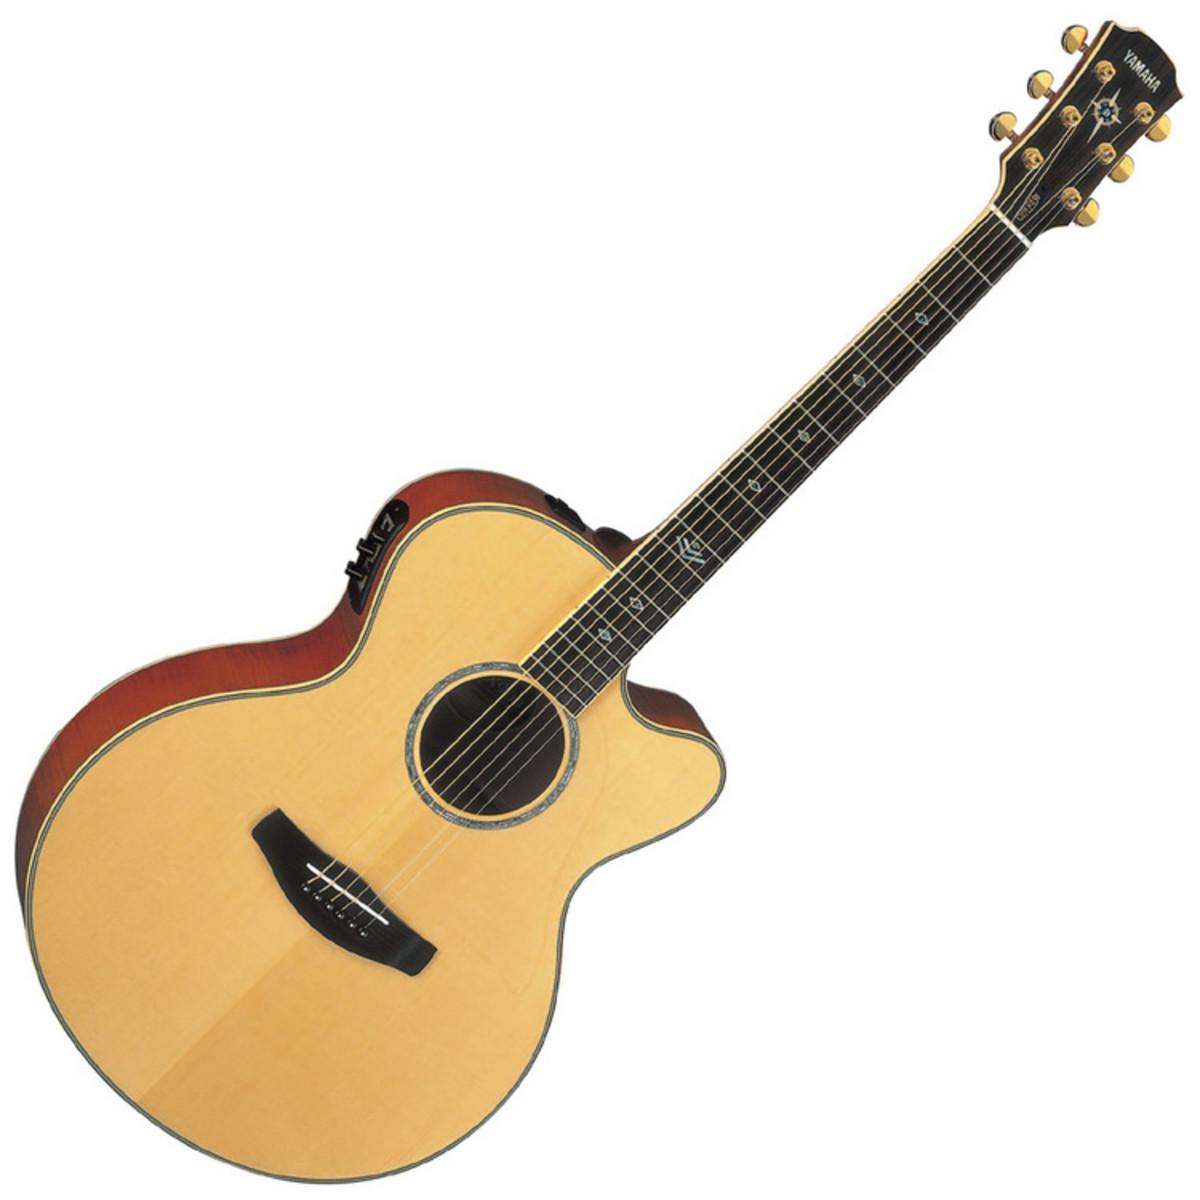 cd yamaha cpx900 elektro akustik gitarre natur bei gear4music. Black Bedroom Furniture Sets. Home Design Ideas